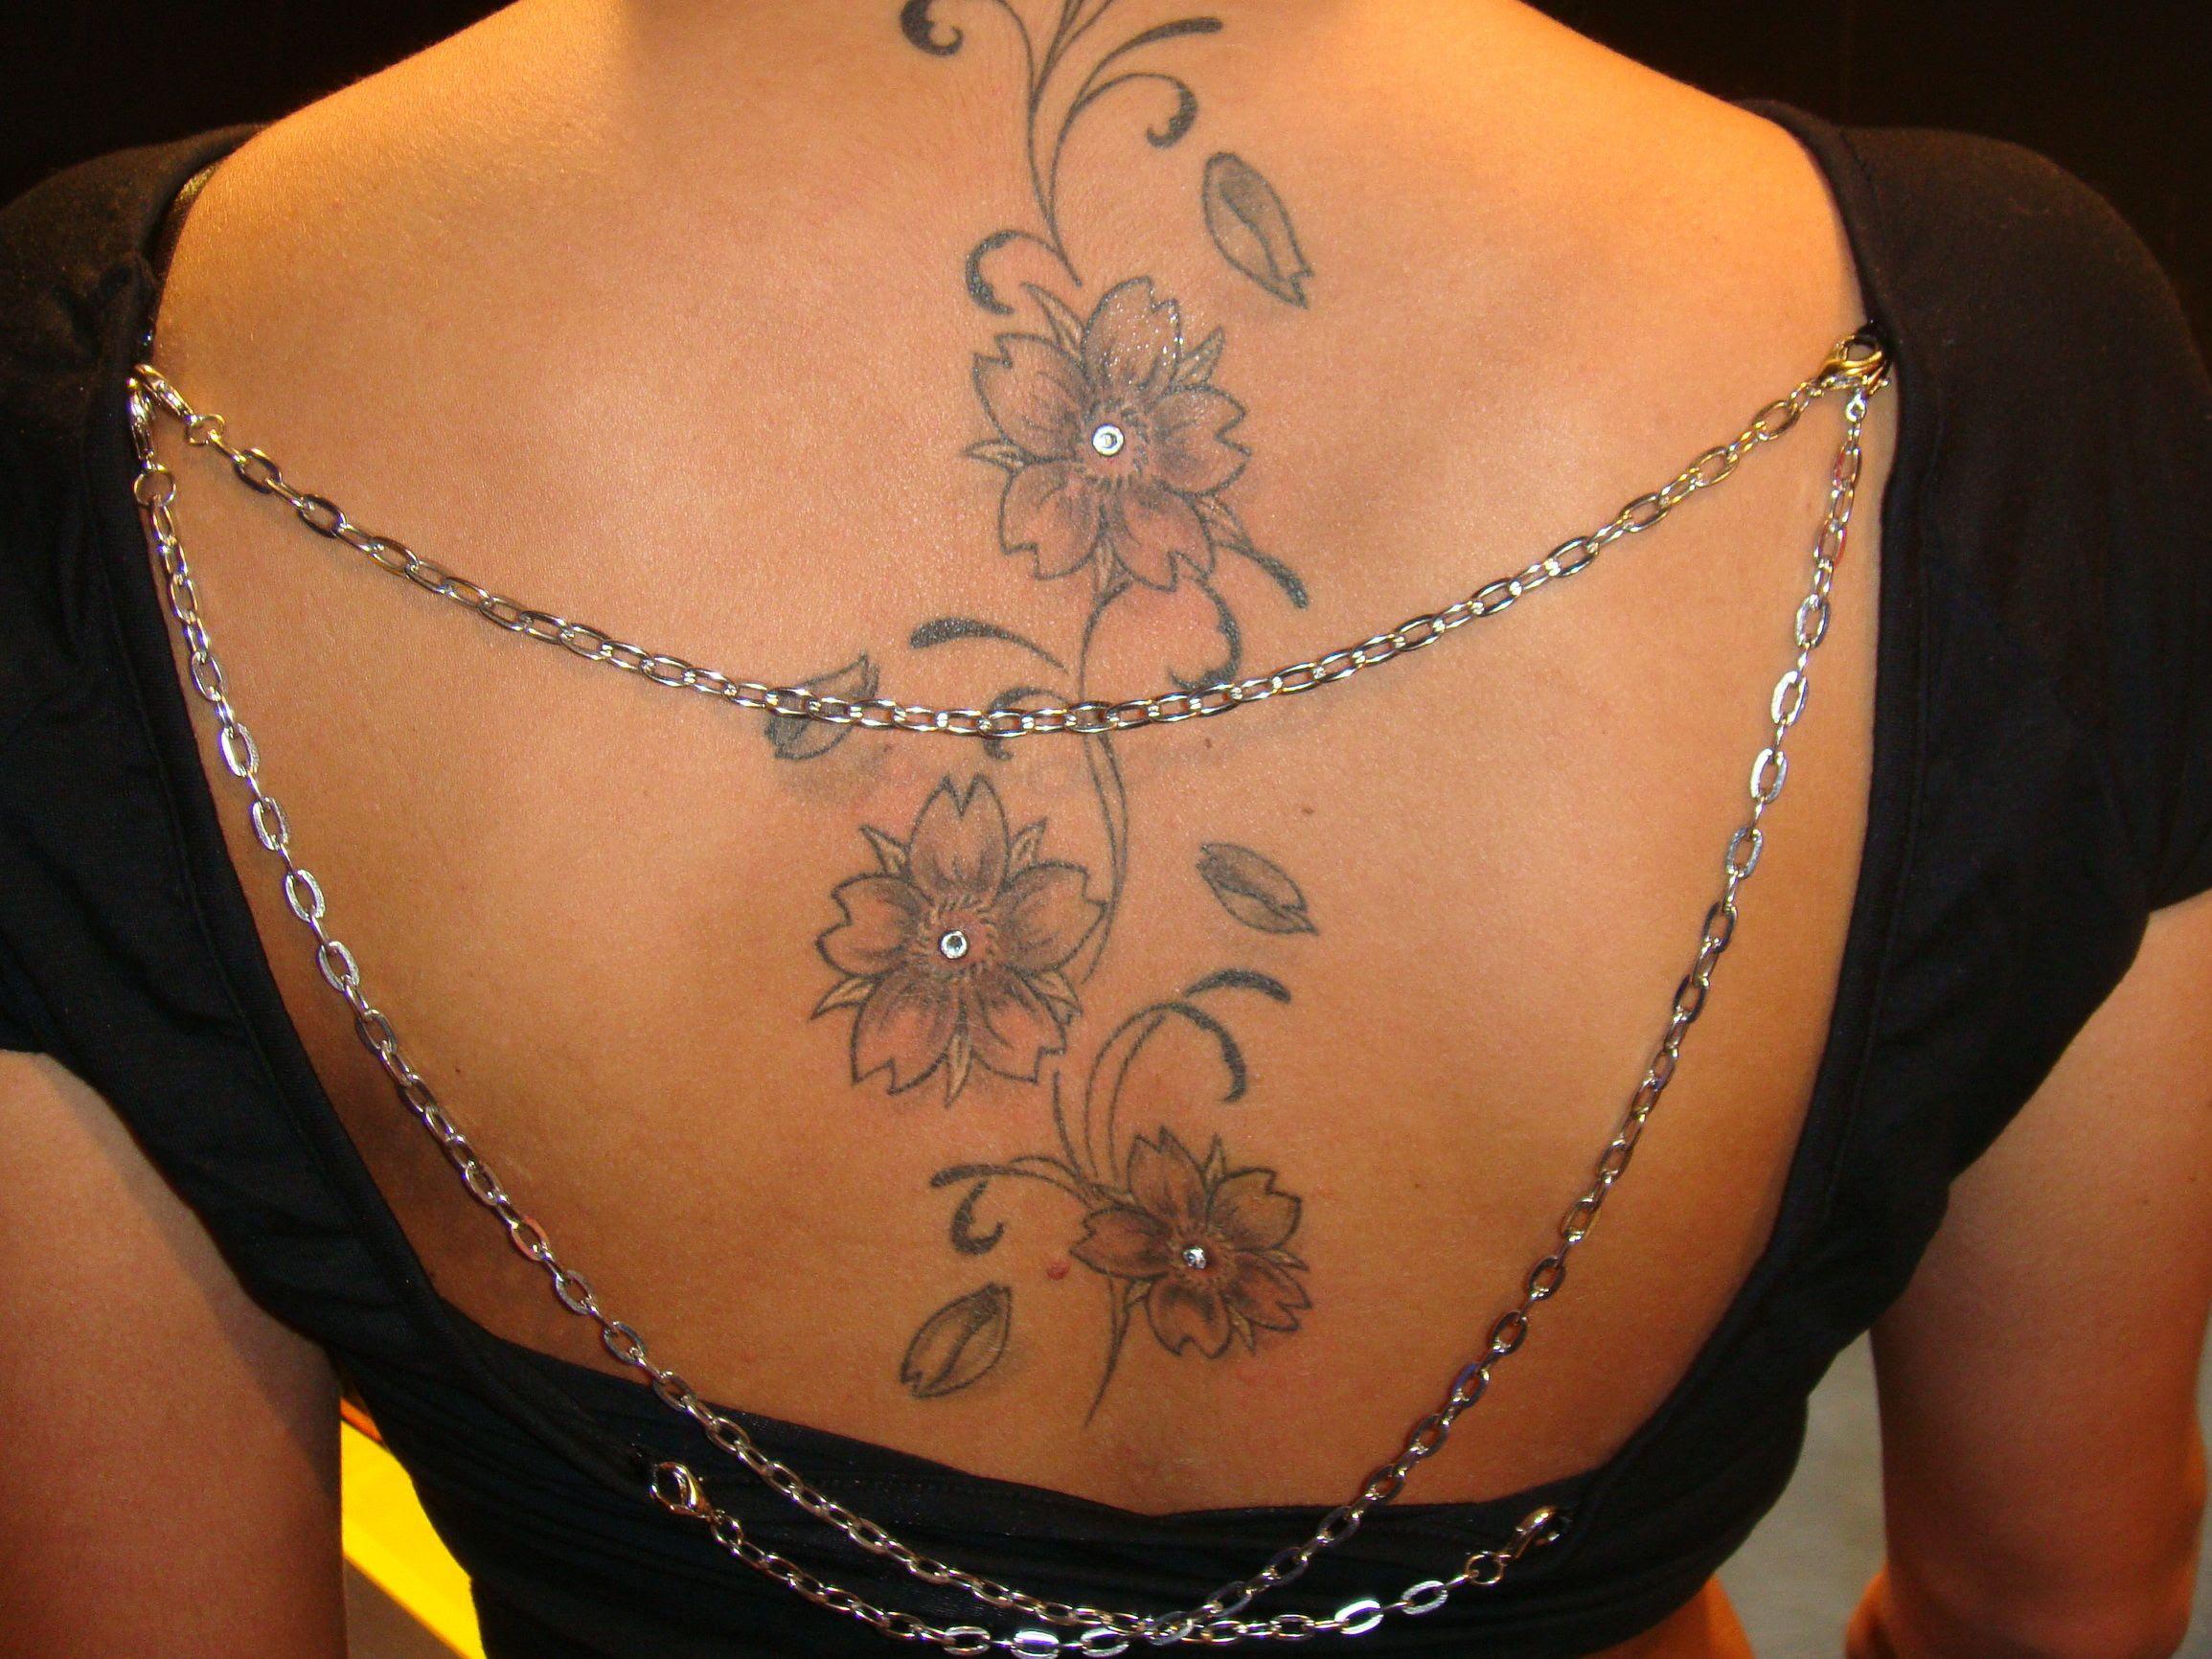 Tattoos Intimbereich